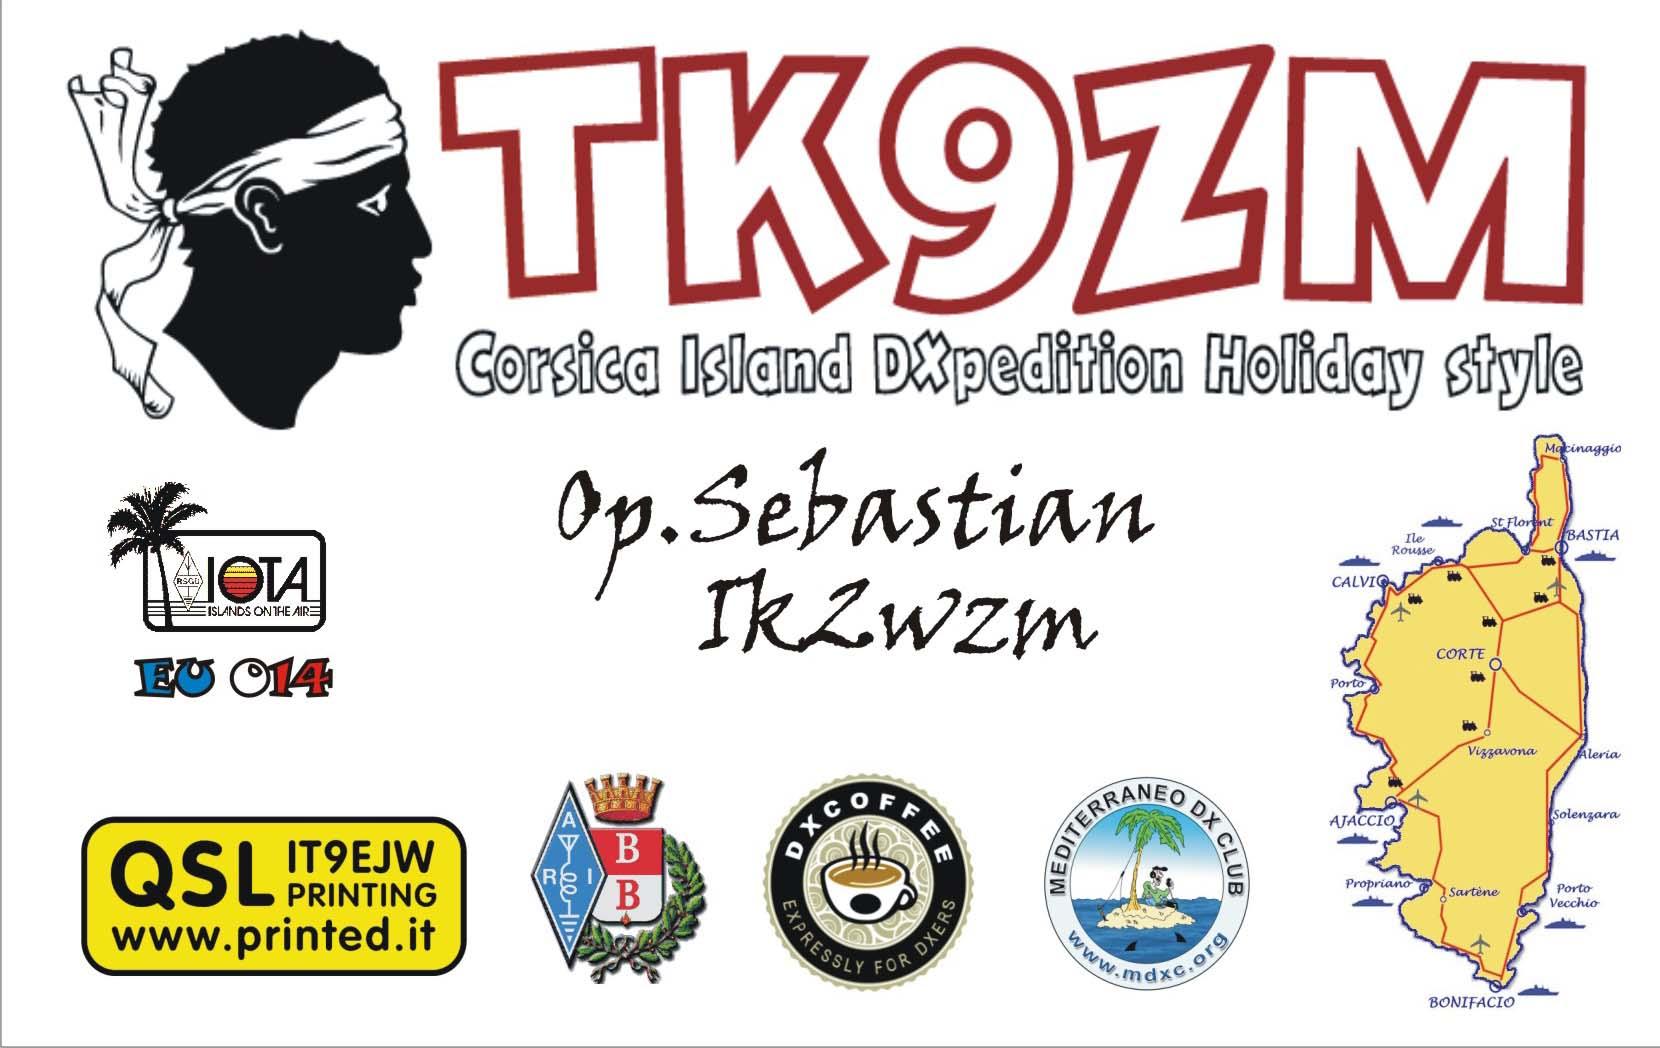 QSL image for IK2WZM